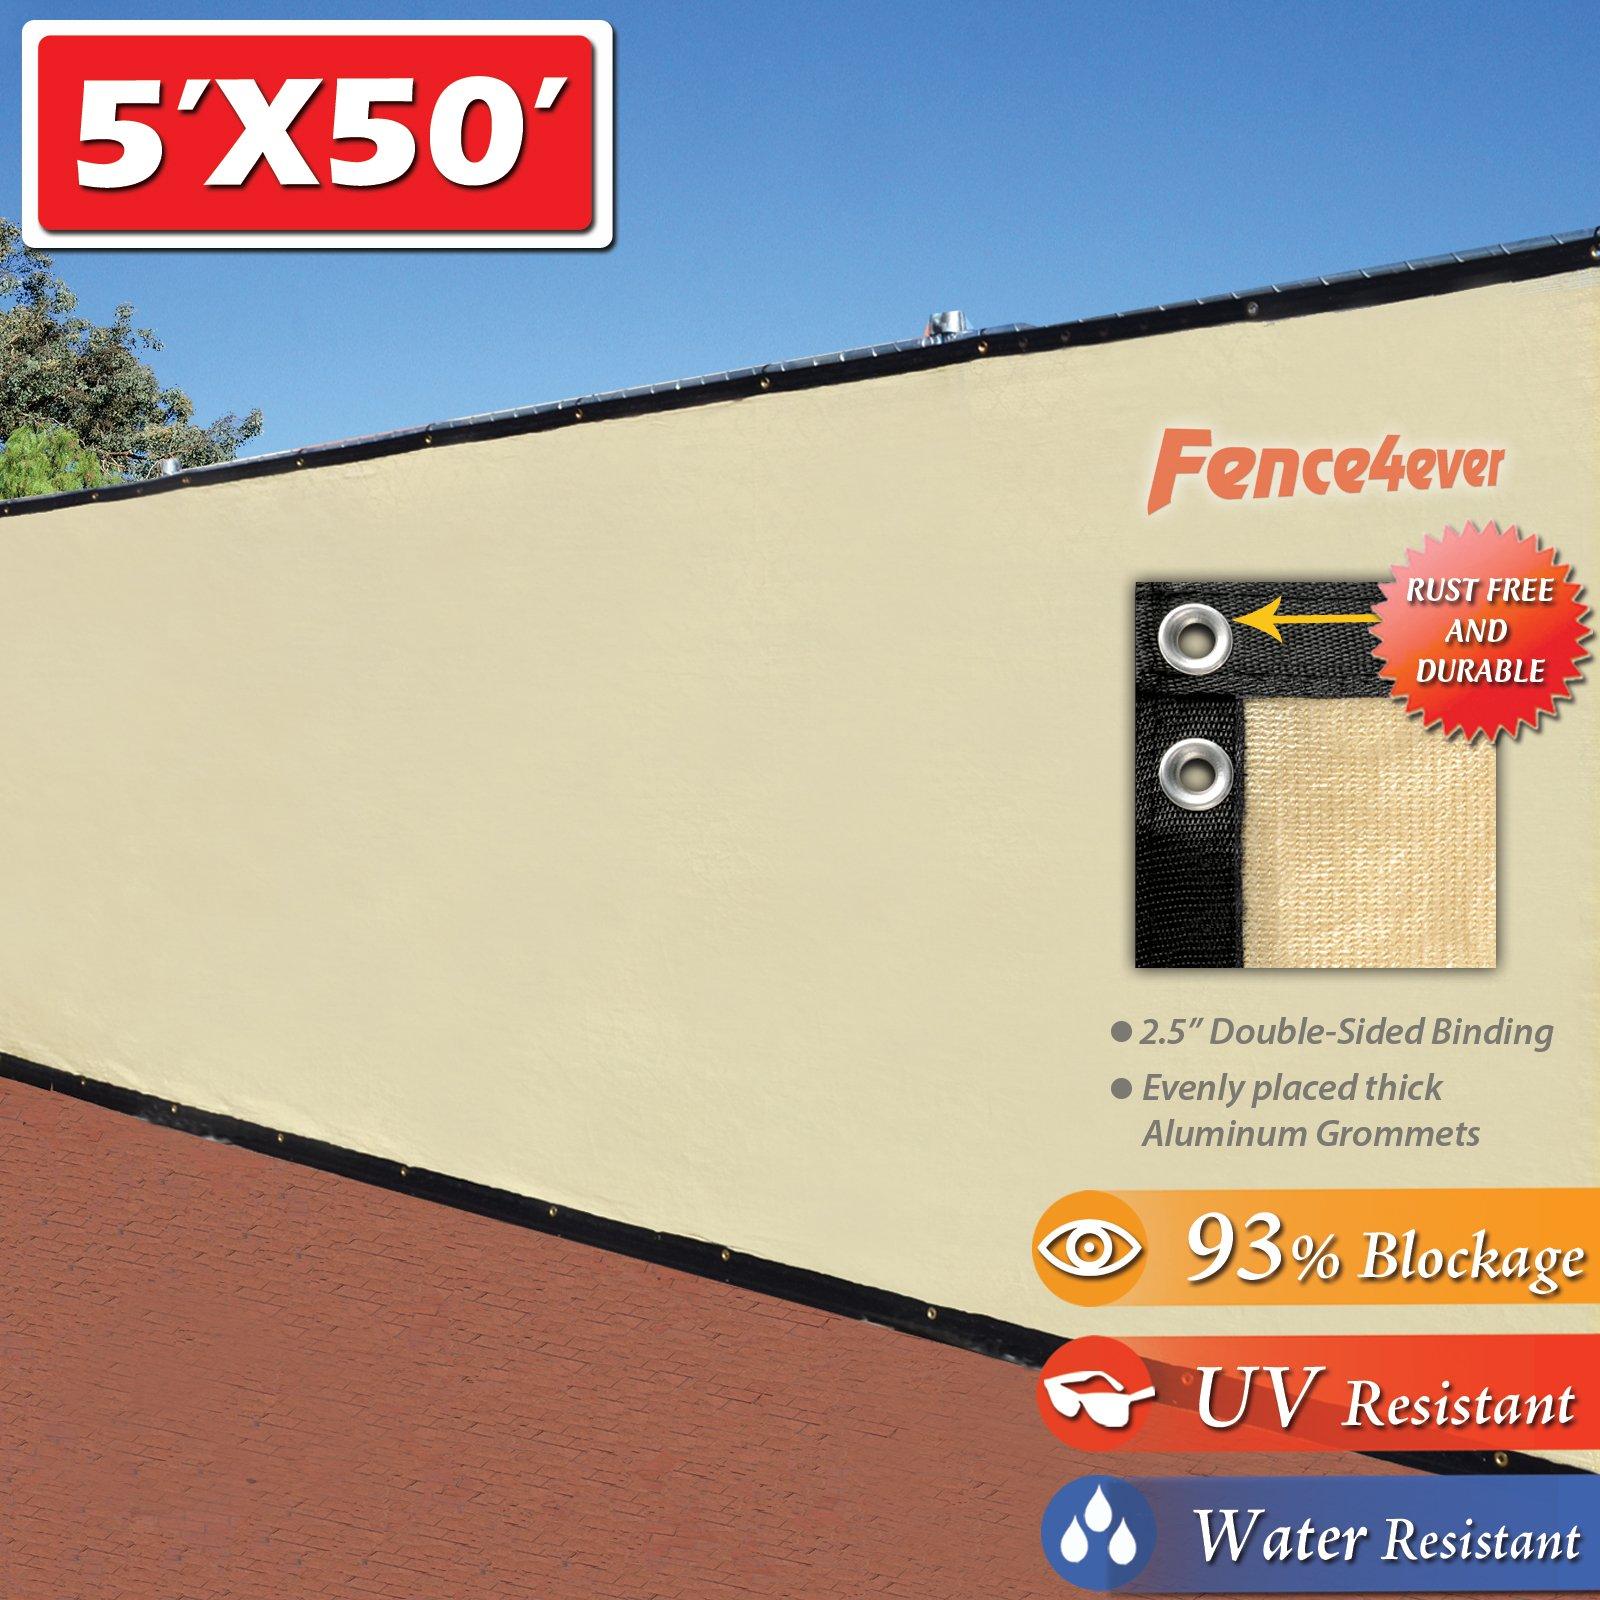 Fence4ever 5' x 50' 3rd Gen Tan Beige Fence Privacy Screen Windscreen Shade Fabric Mesh Tarp (Aluminum Grommets)